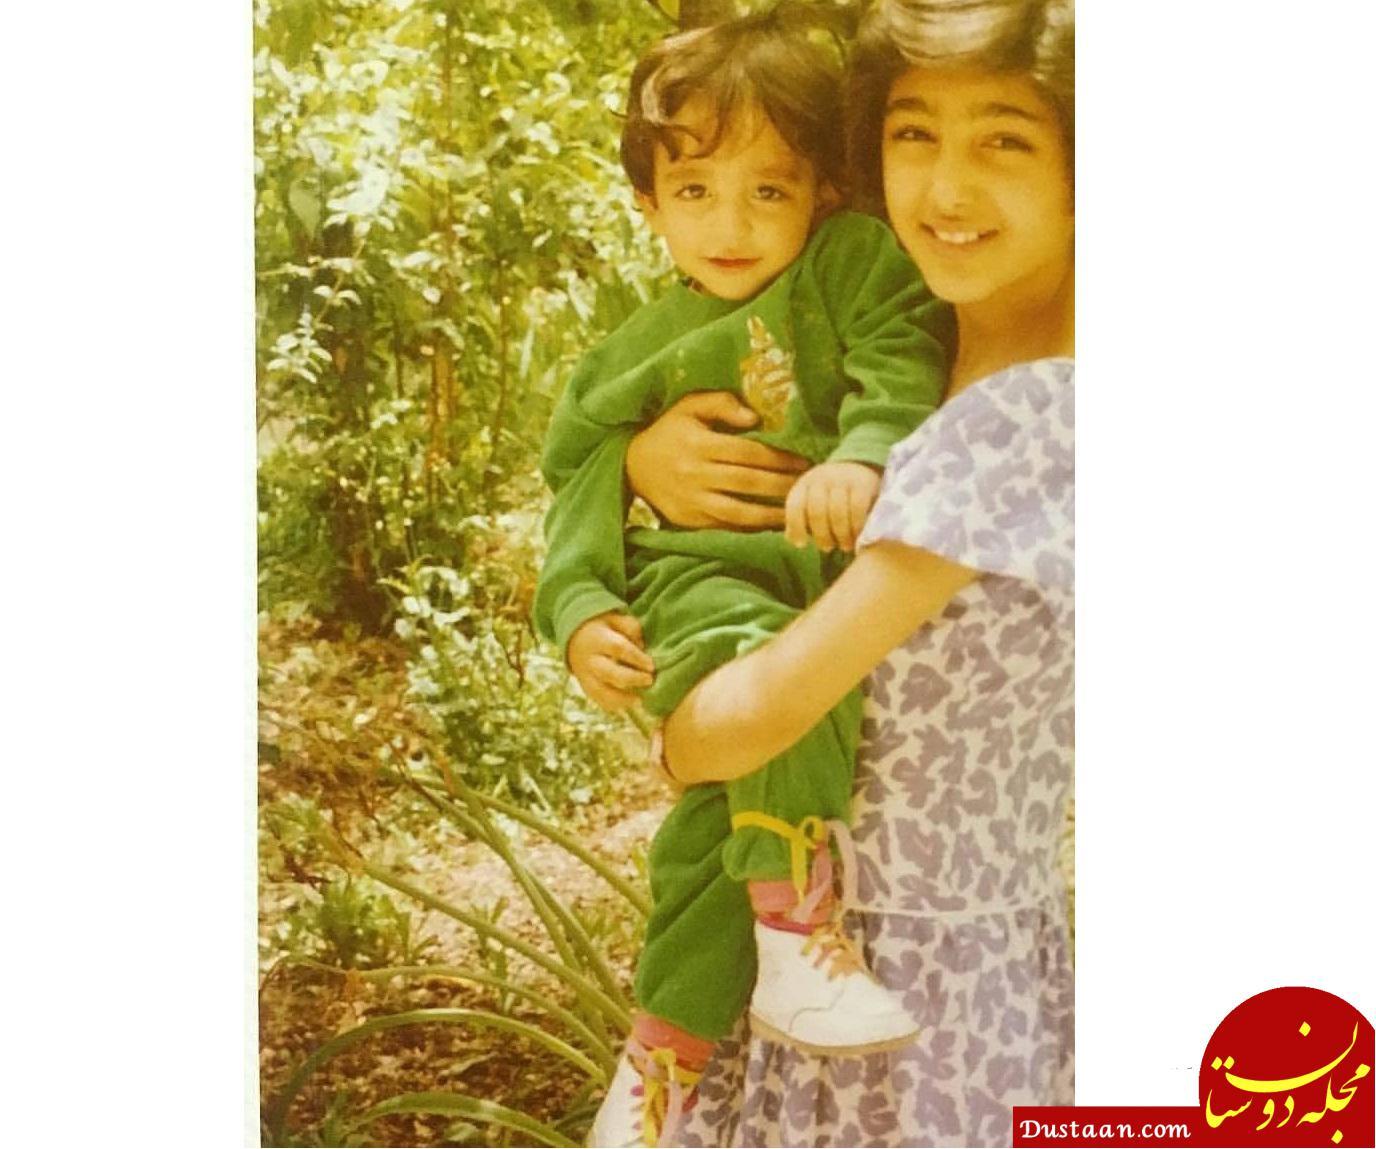 www.dustaan.com گلشیفته فراهانی و خواهرزاده اش سام 20 سال پیش! +عکس